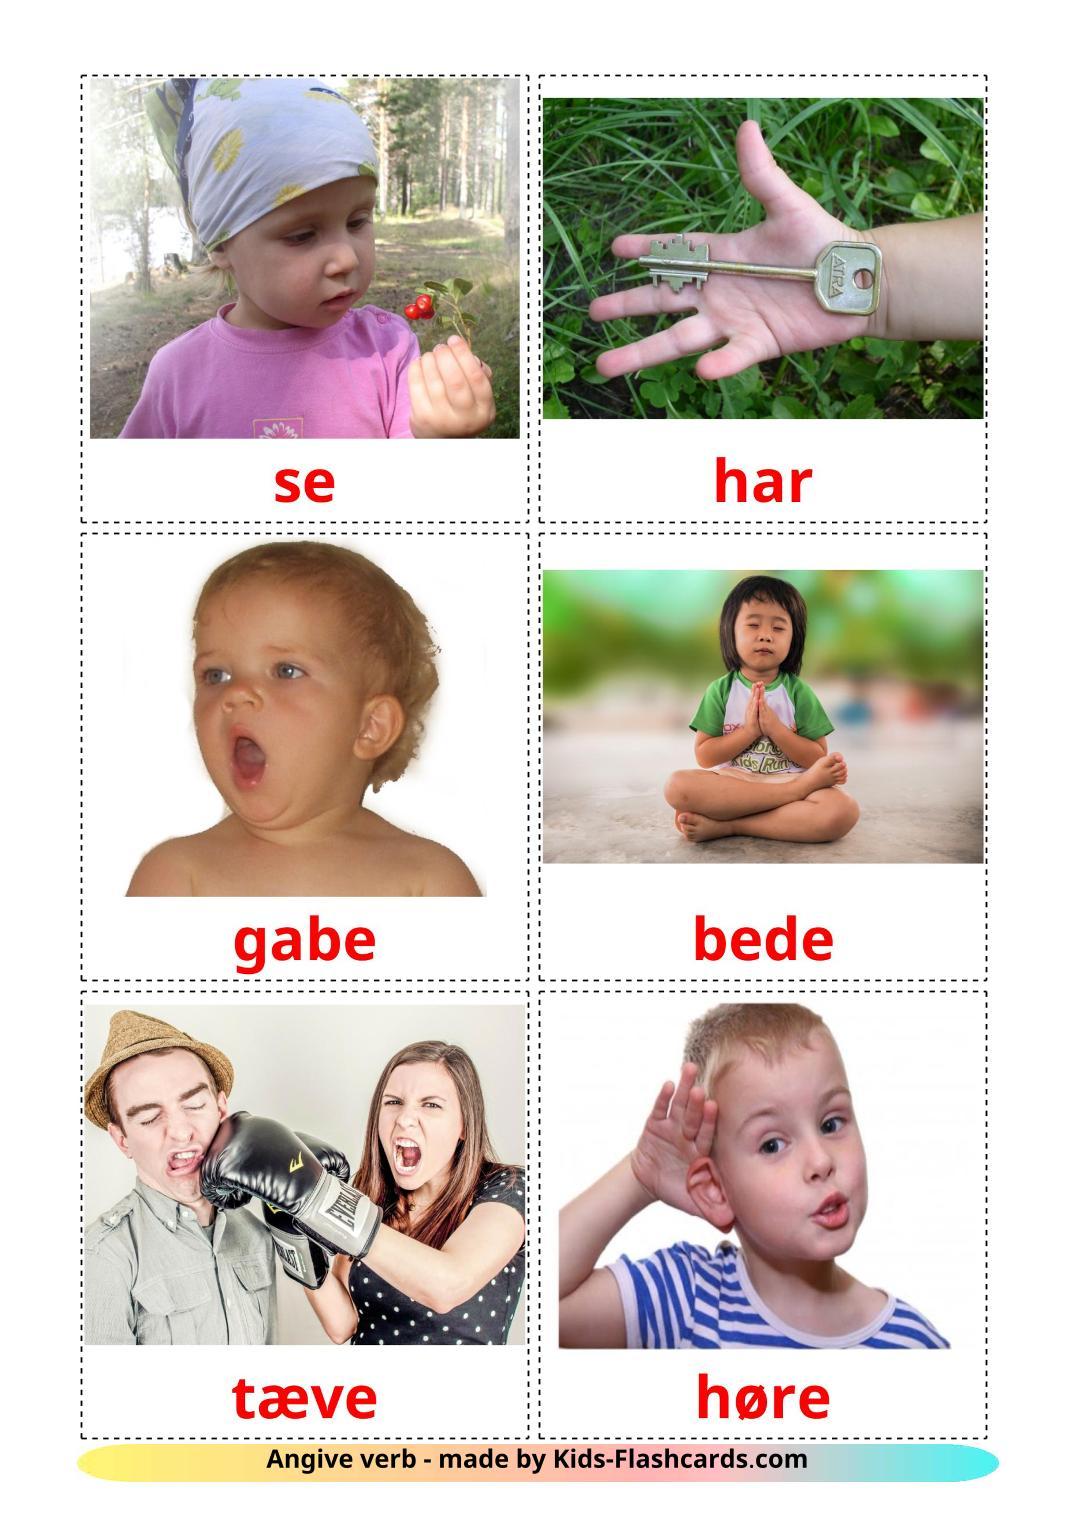 State verbs - 23 Free Printable dansk Flashcards